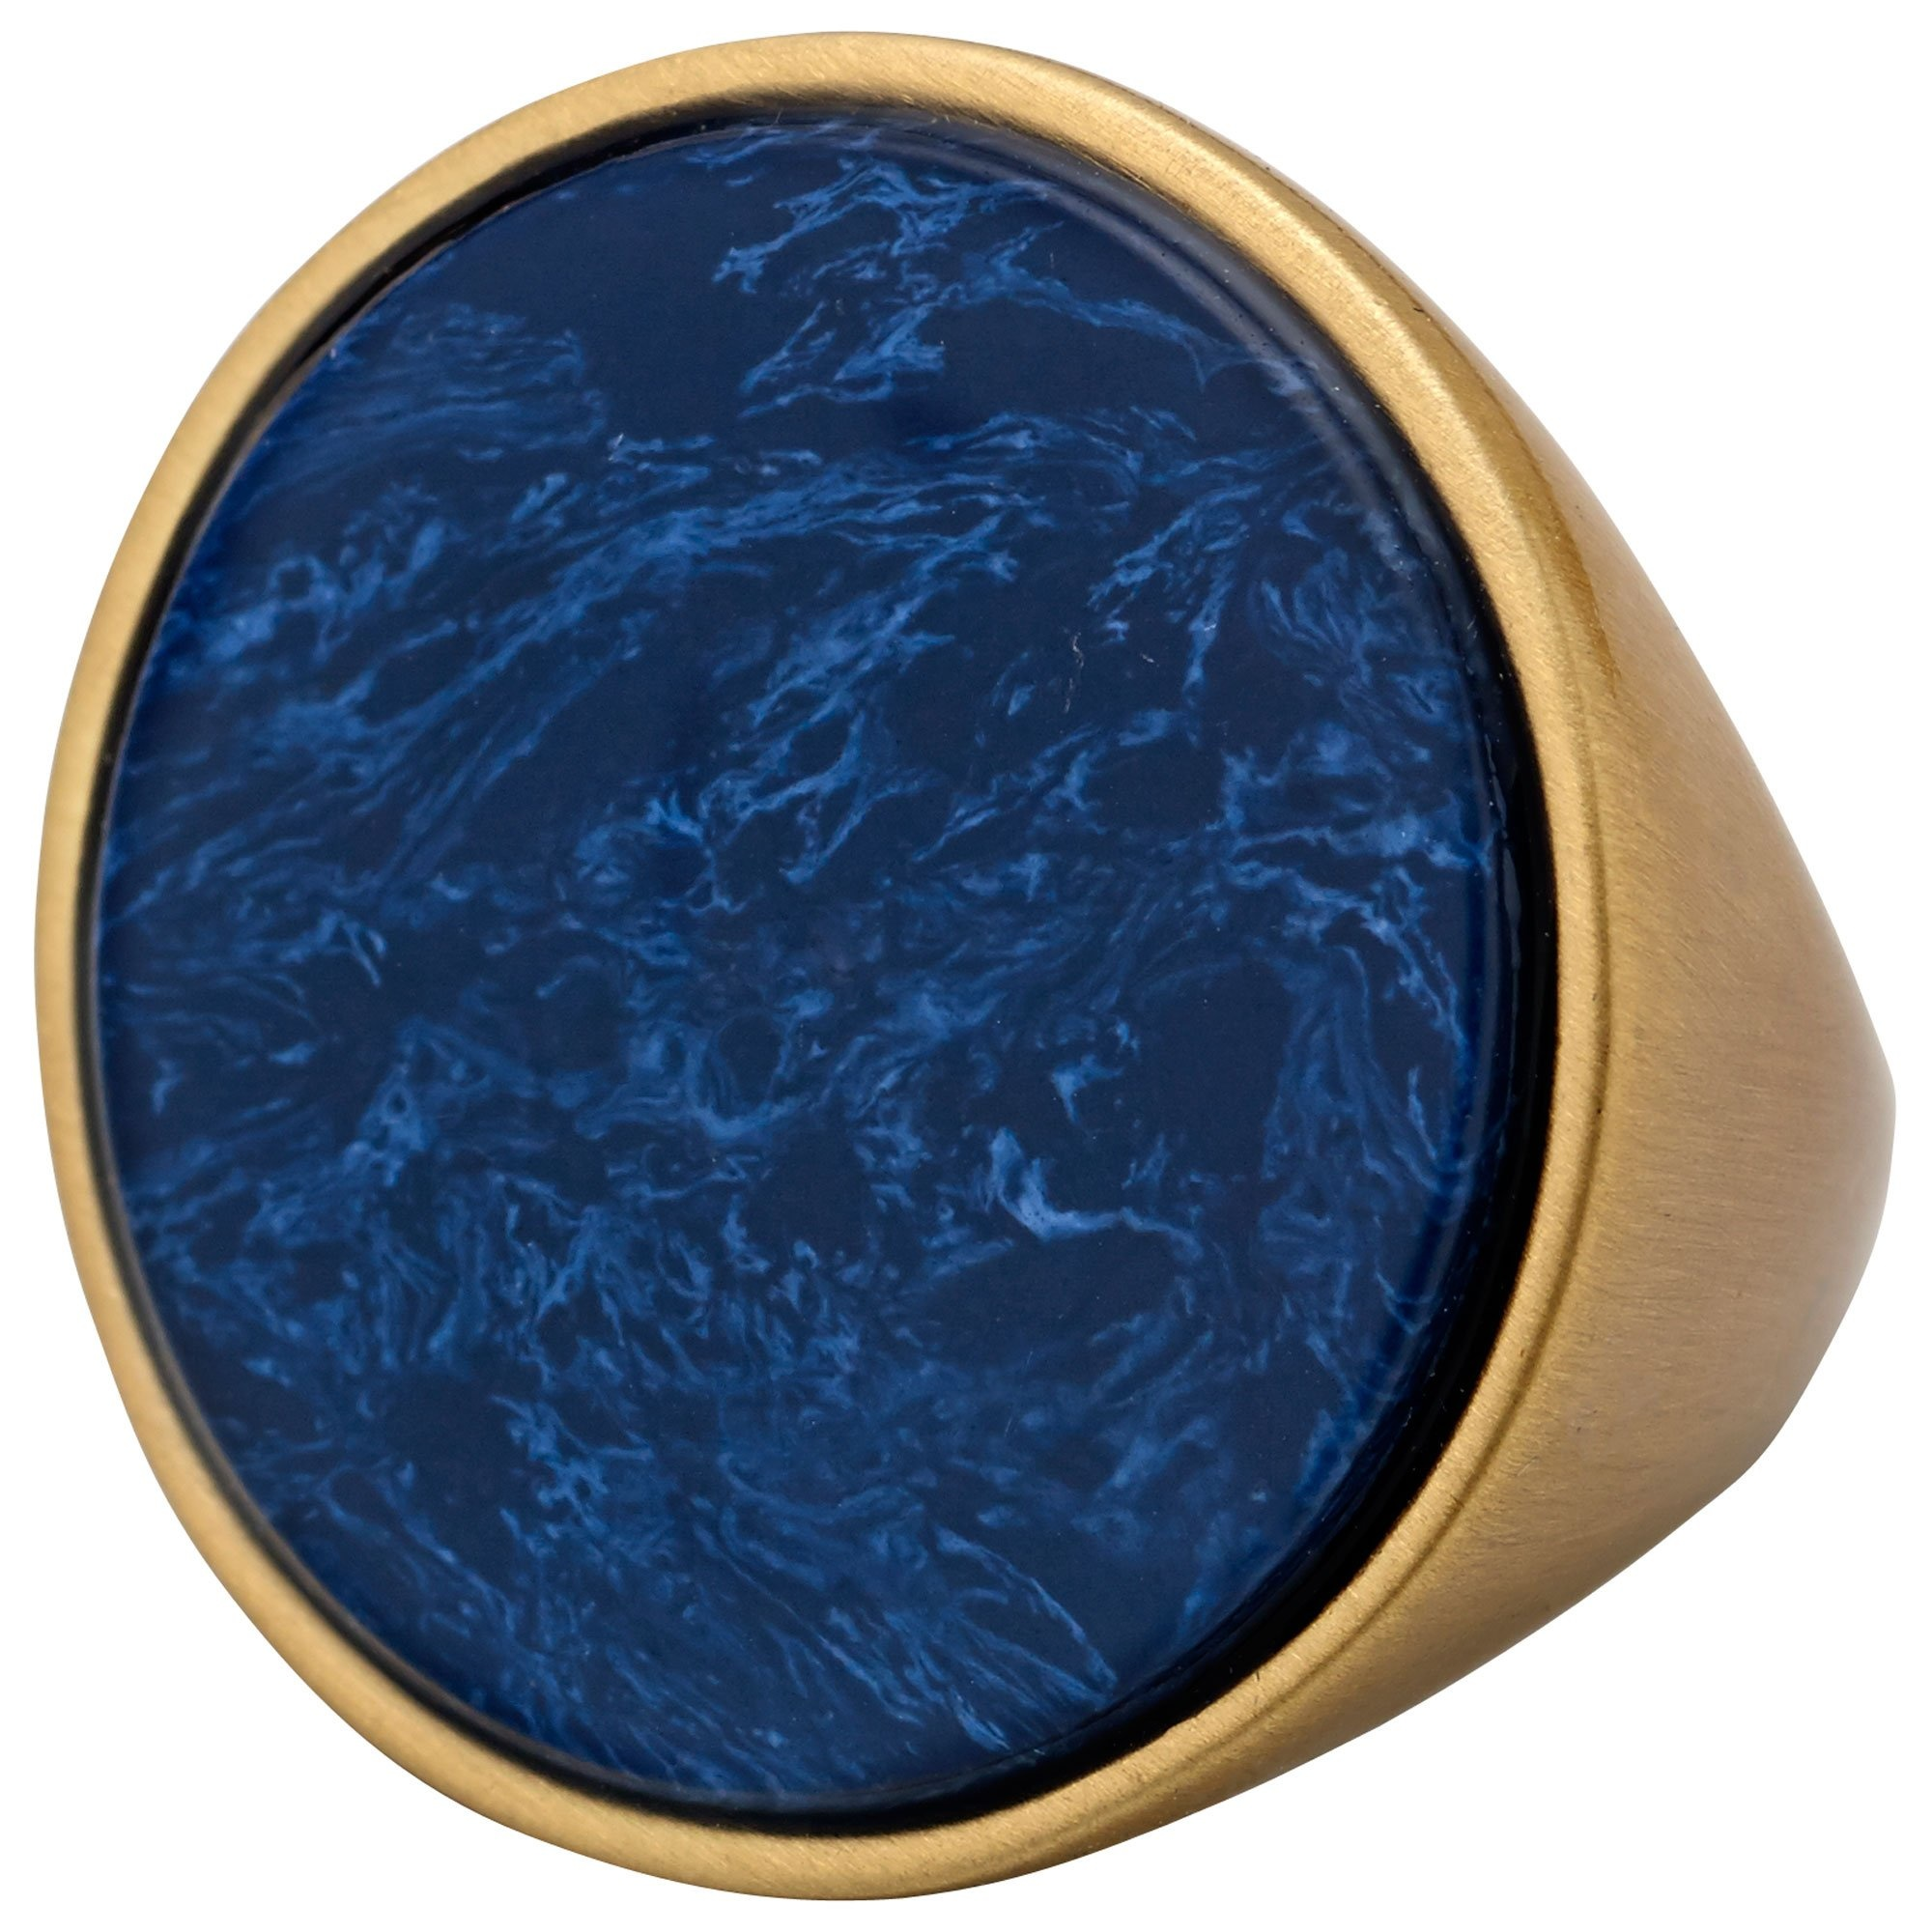 Pilgrim Grosse bague Or et Bleu